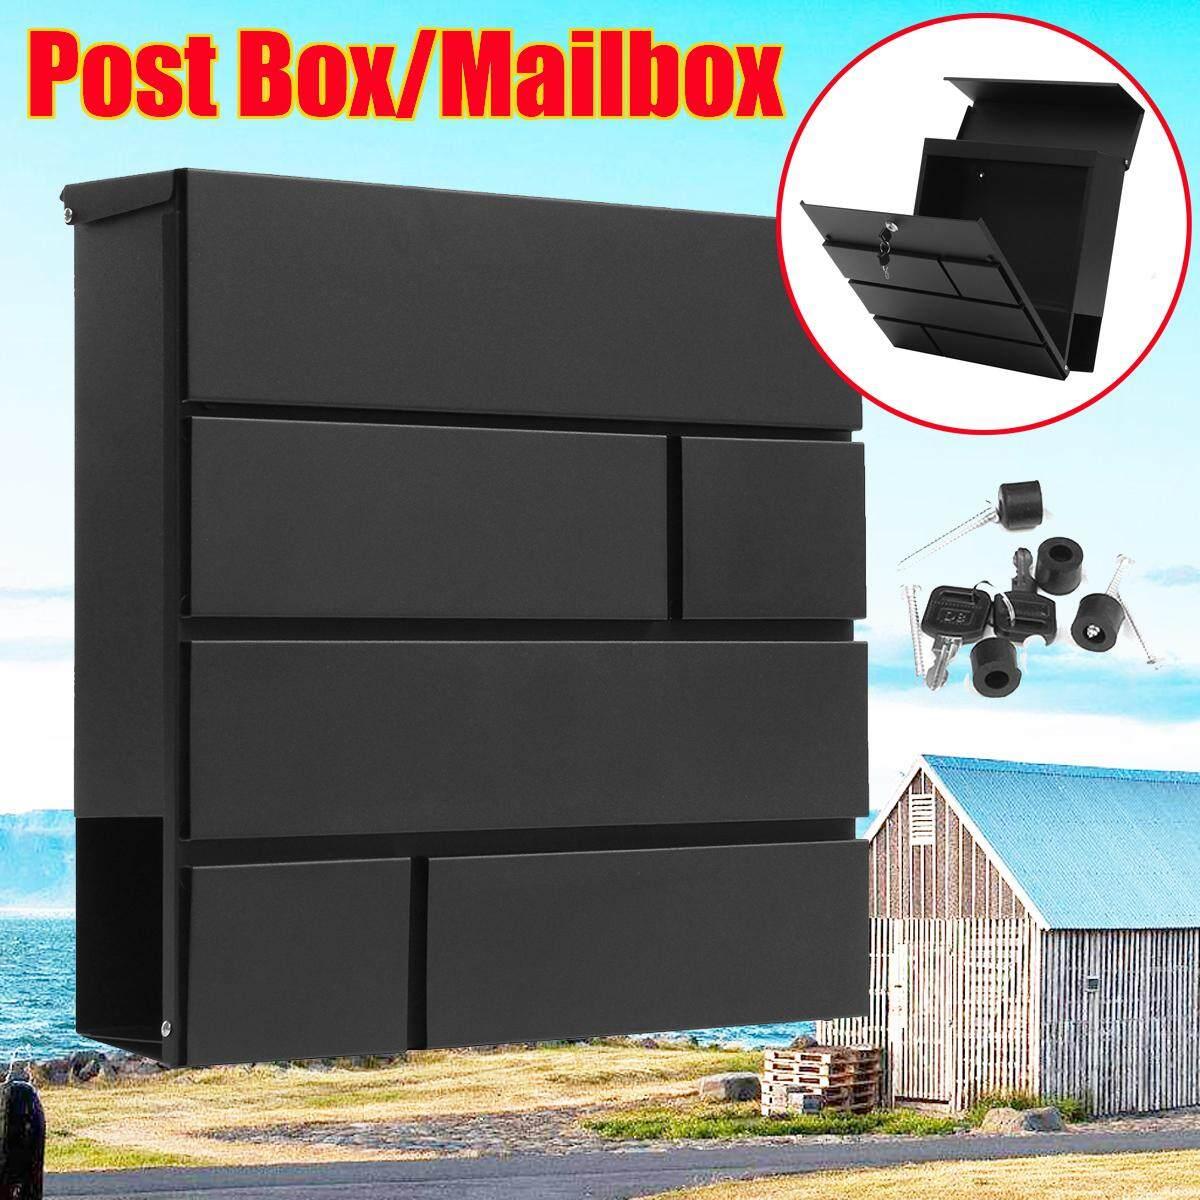 Designer mailbox V16 Postbox Anthracite newspaper box powder coated Postbox